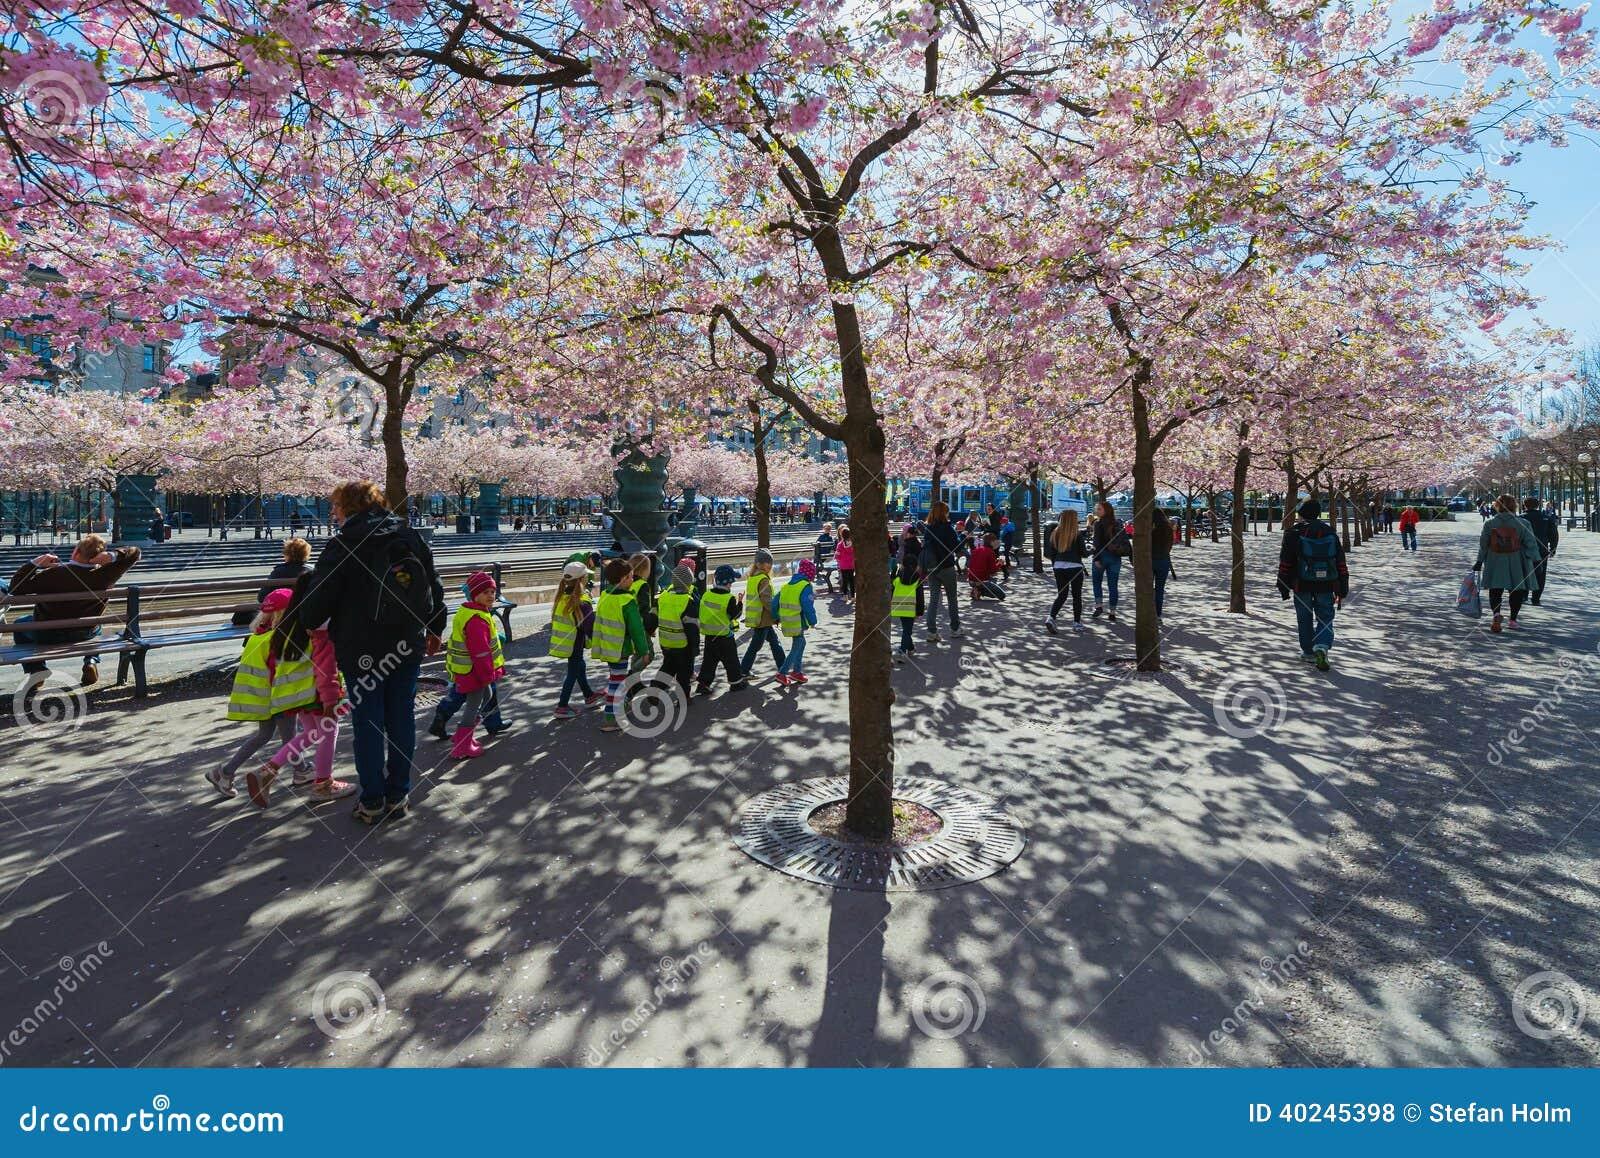 Cherry blossom in Kungstradgarden with herded children